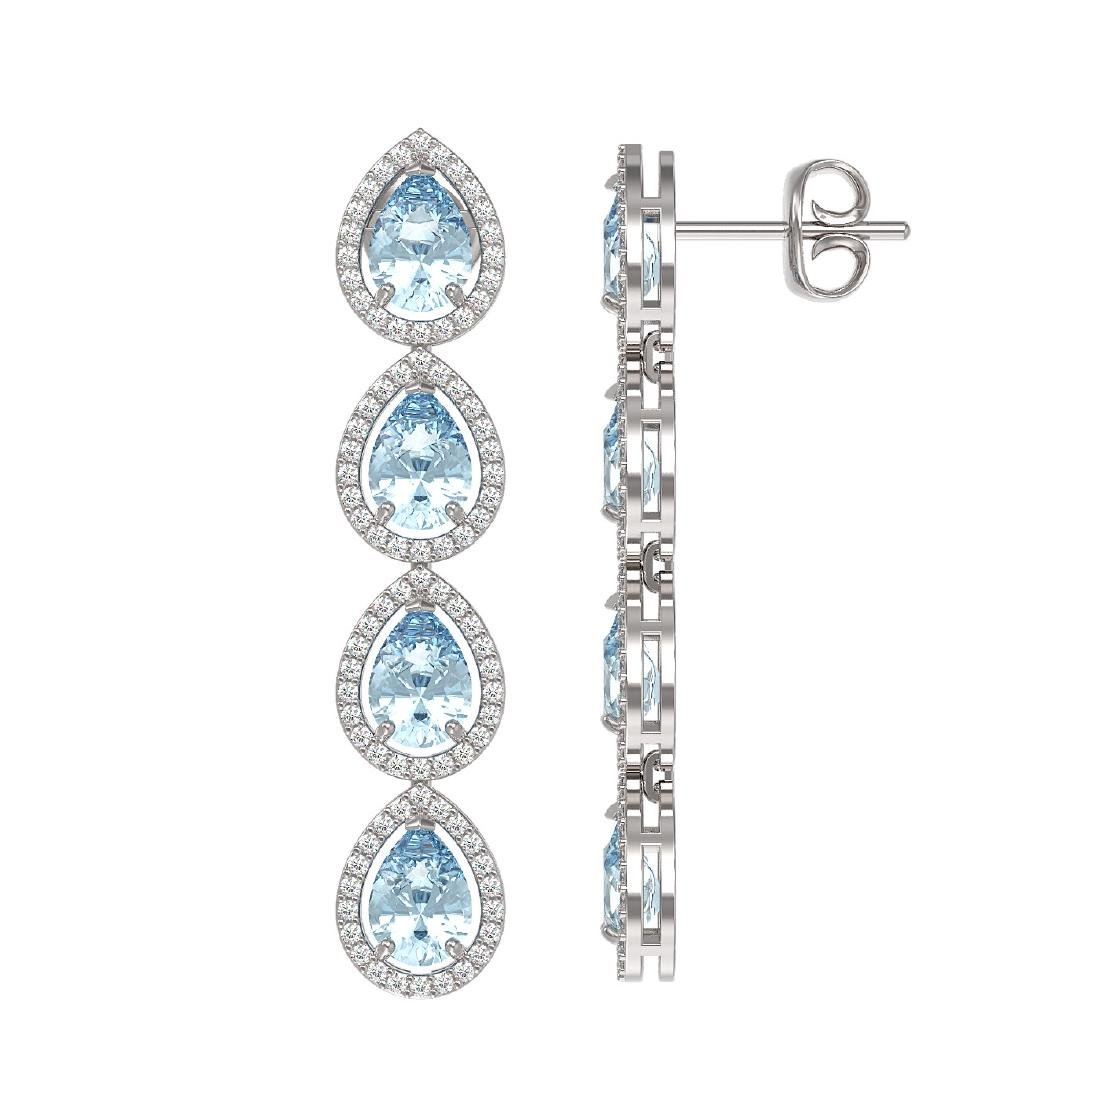 7.81 CTW Sky Topaz & Diamond Halo Earrings 10K White - 2